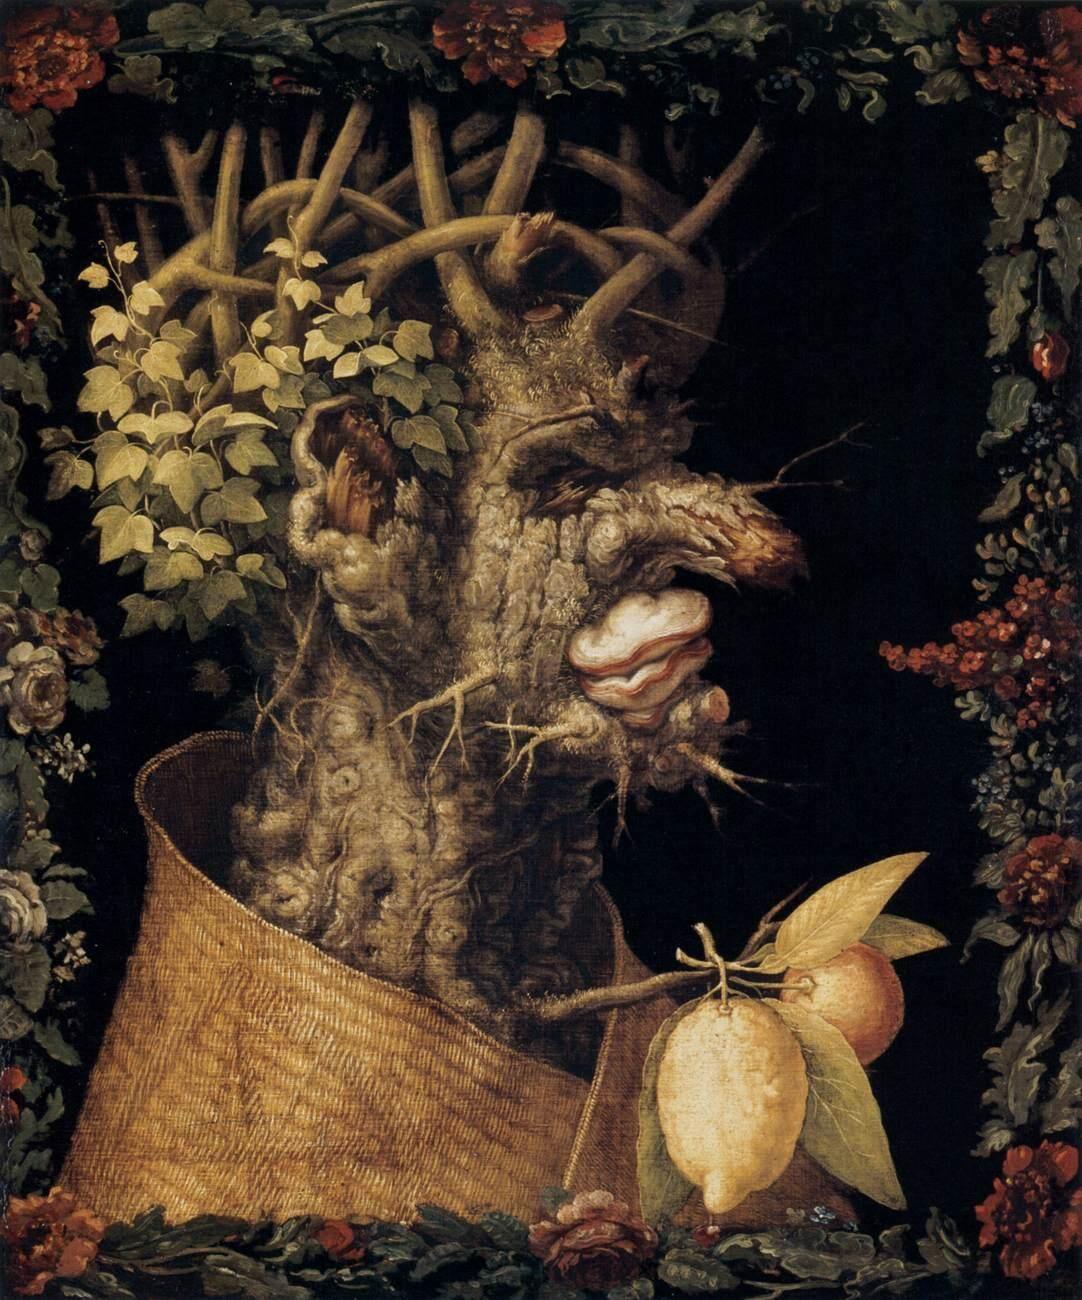 Giuseppe Arcimboldo, Winter, 1573. Photo via Wikimedia Commons.